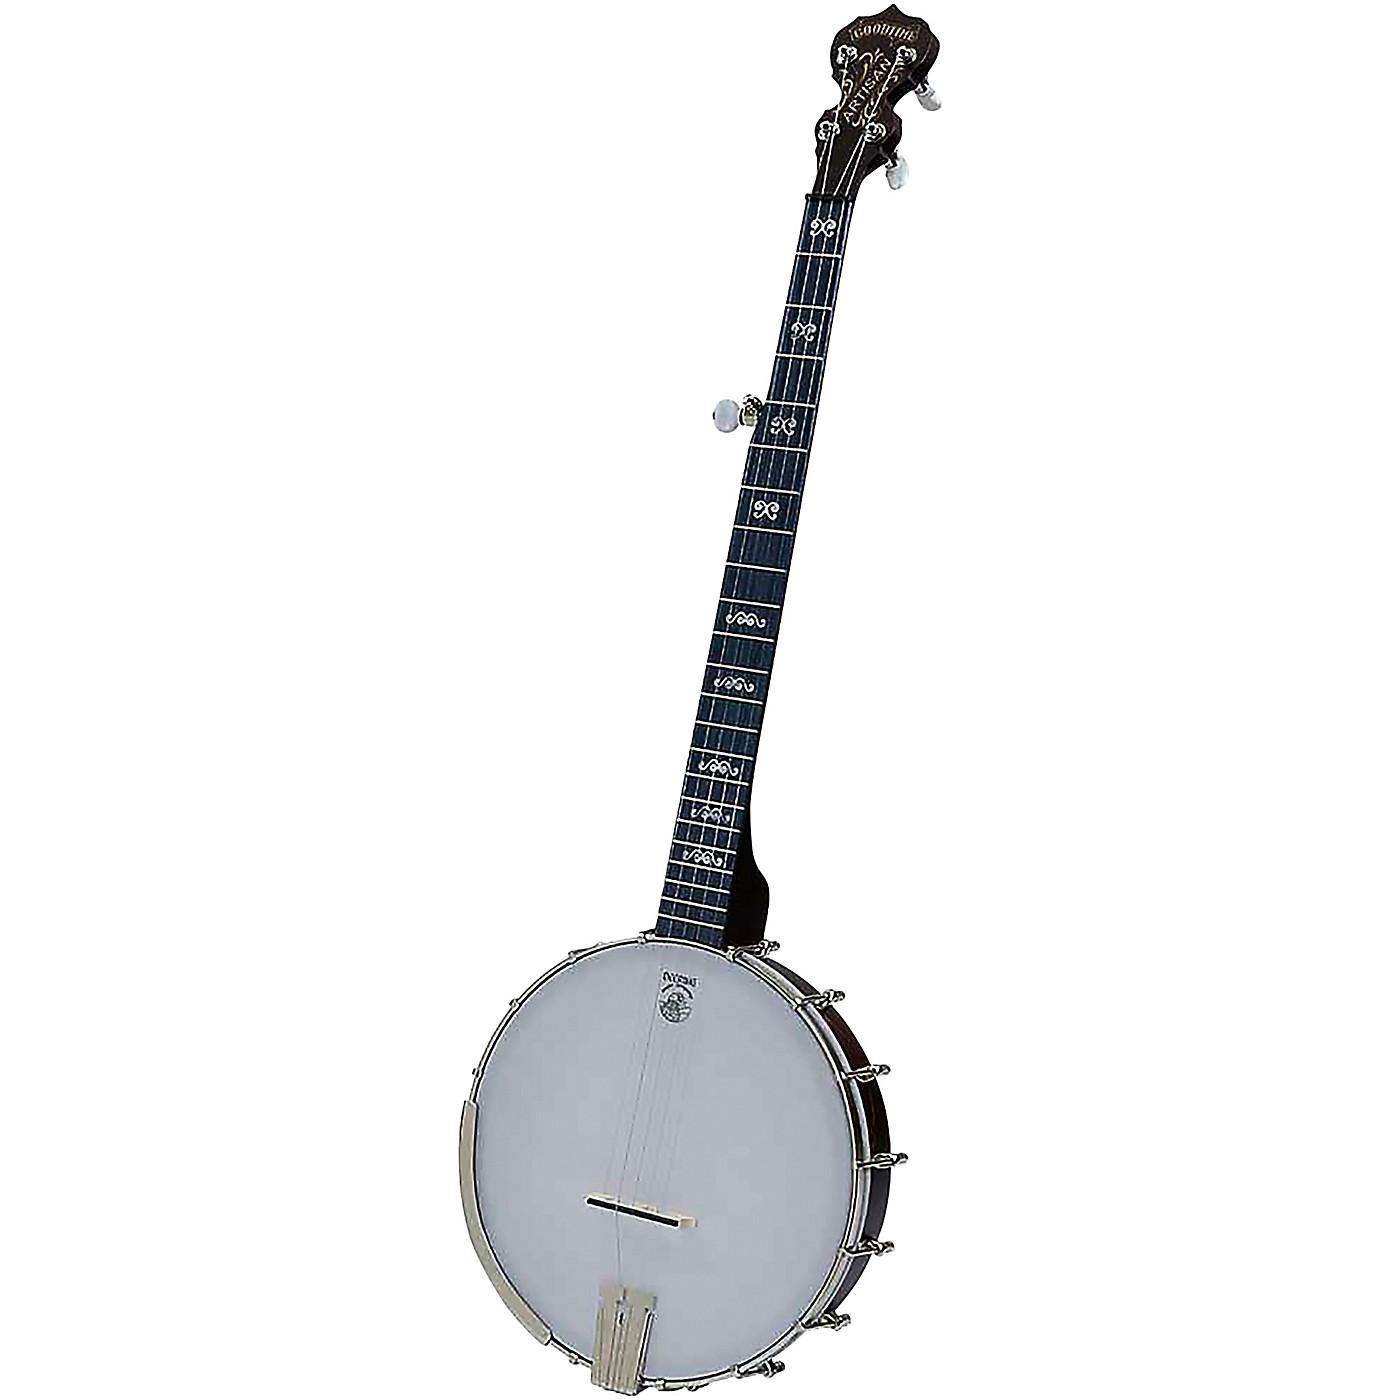 Deering Artisan Goodtime 5-String Open Back Banjo thumbnail